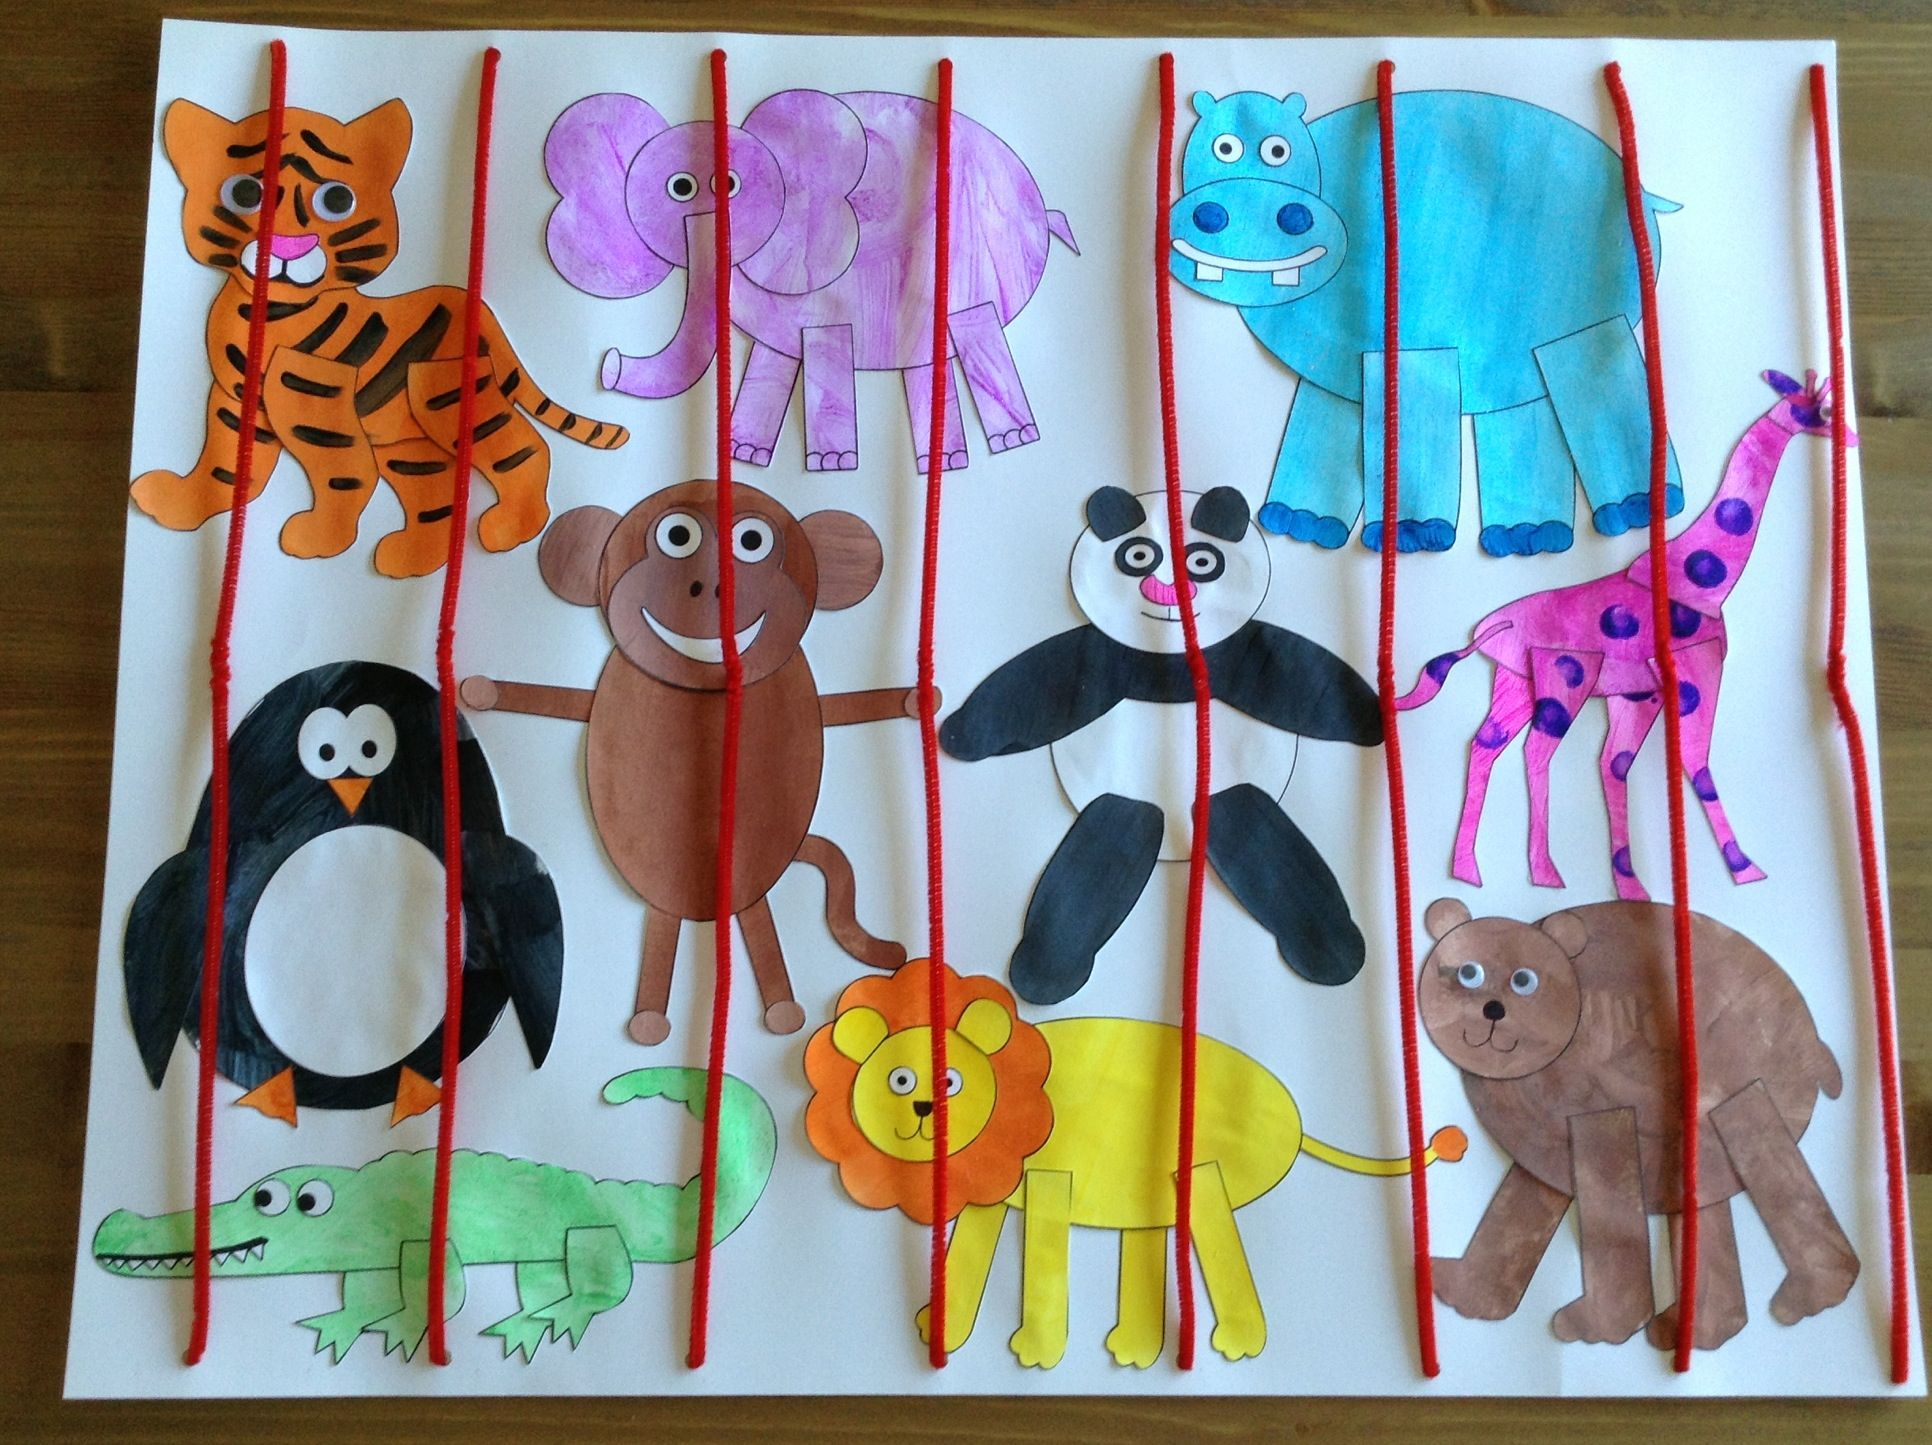 50 zoo animal crafts for kids zoo animal crafts animal crafts